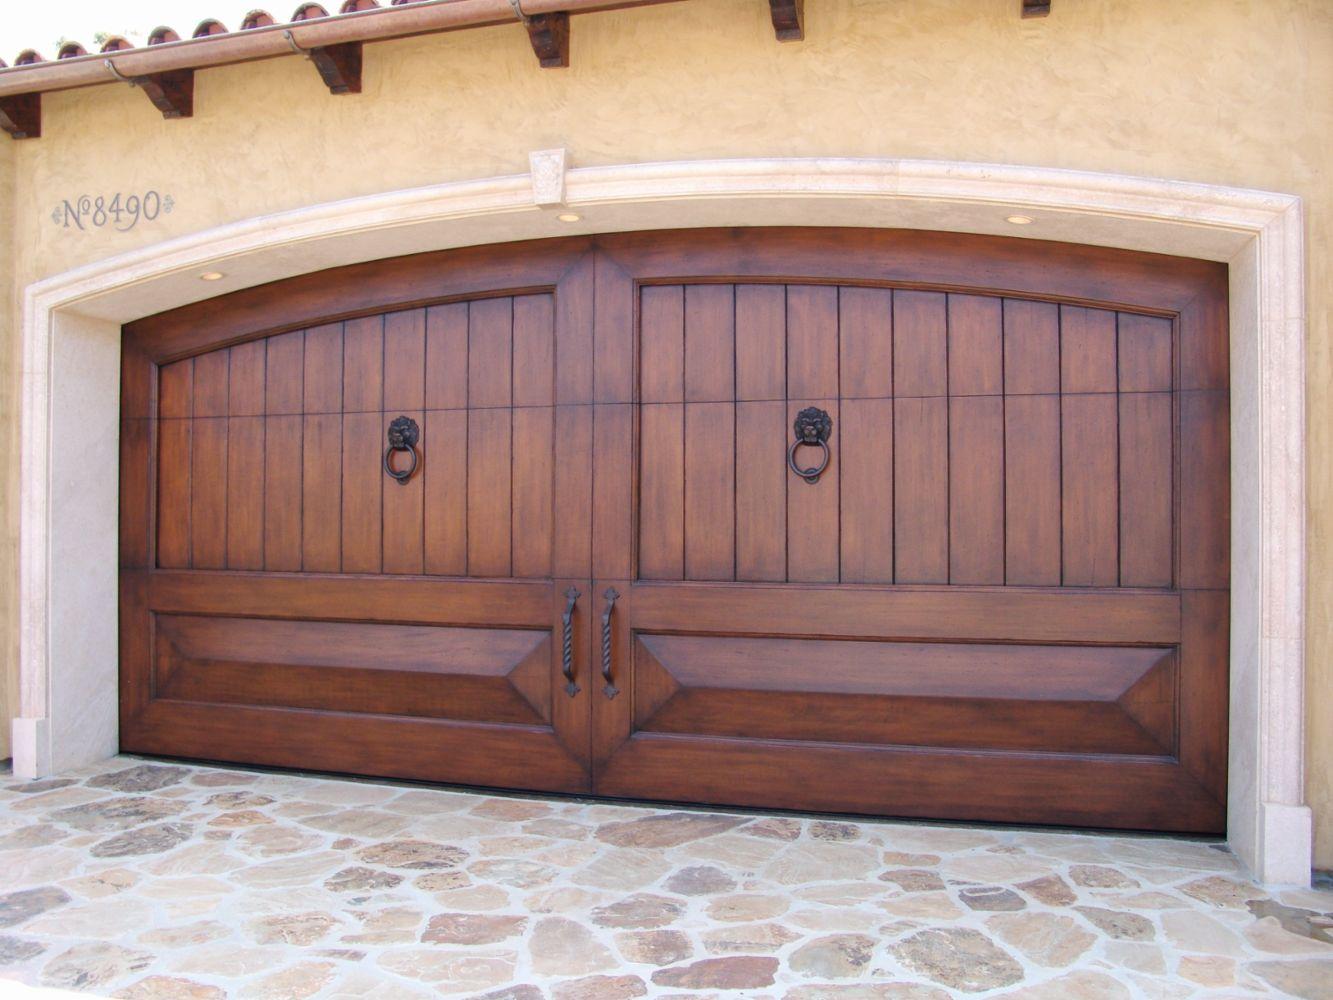 8185784826 in tarzana ca tarzana quality garage door repair for Garage door repair agoura hills